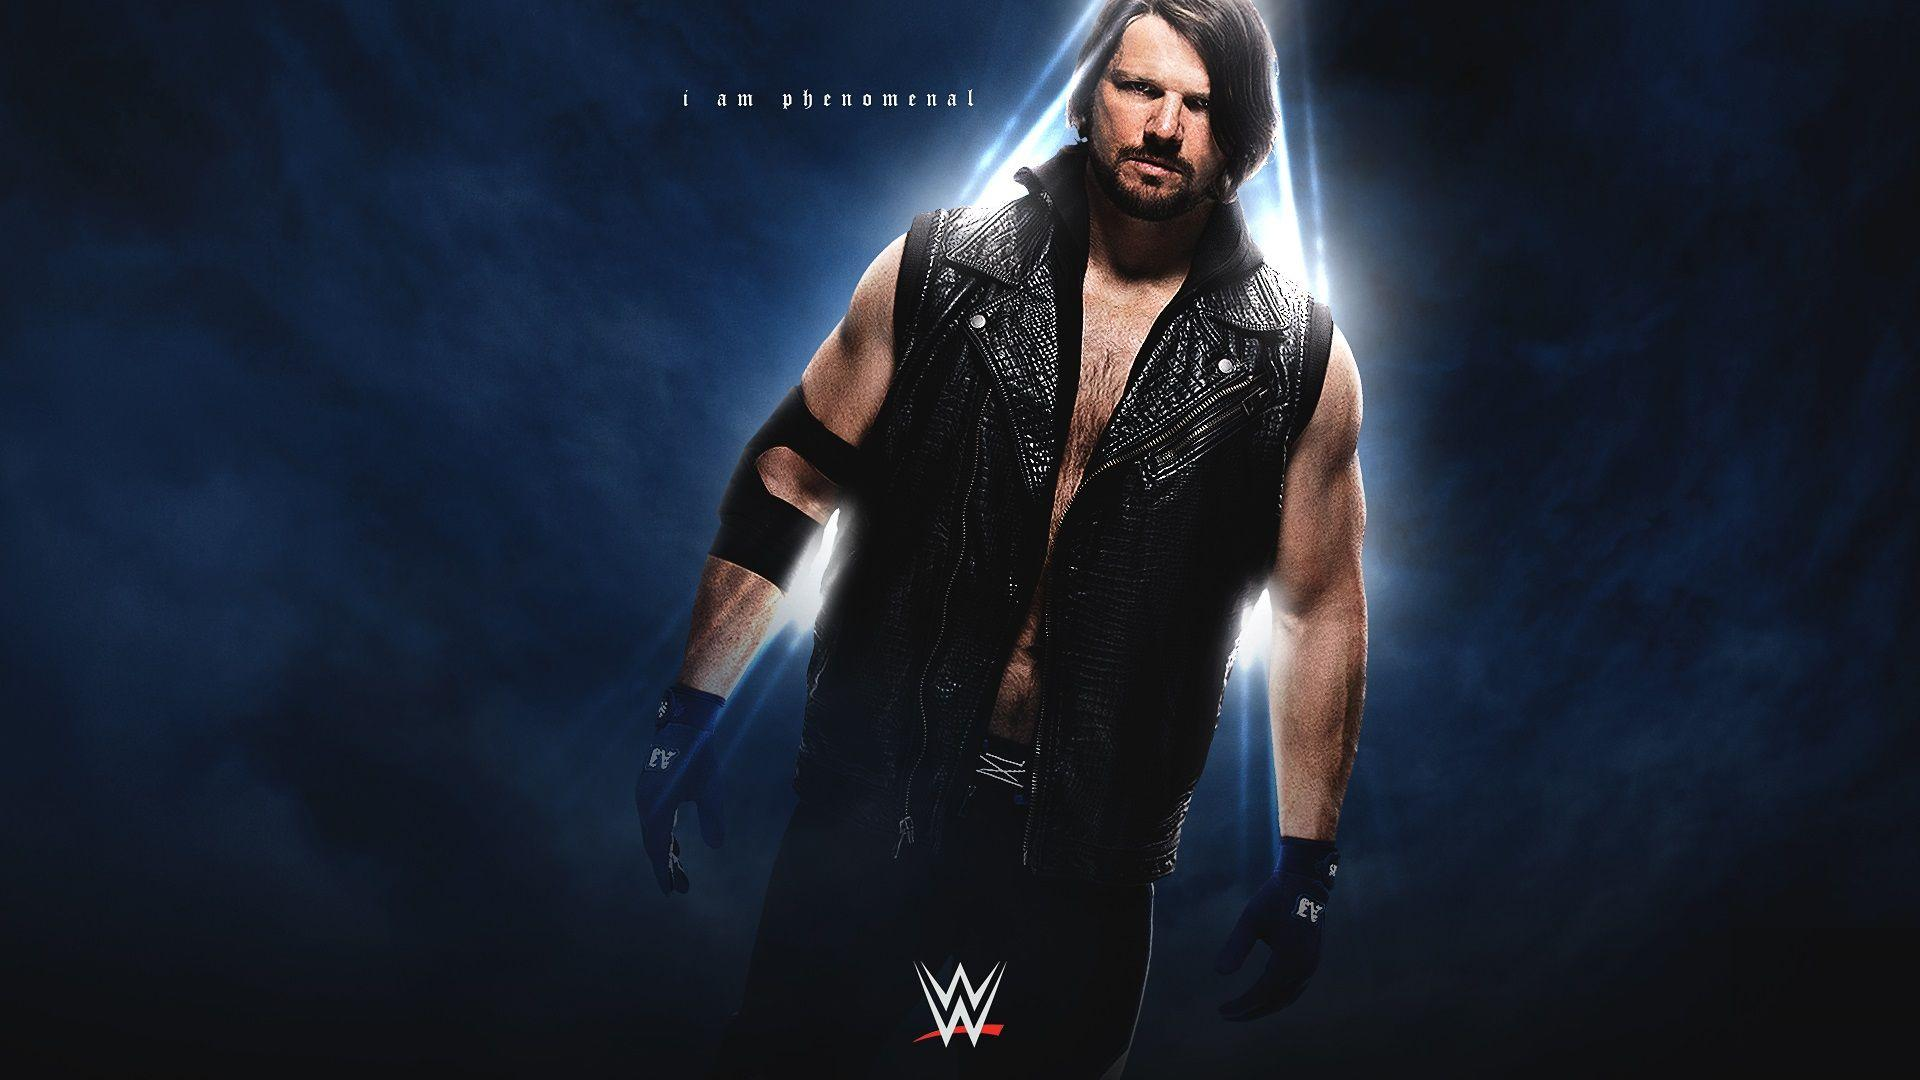 WWE Wrestler AJ Styles Wallpapers HD Pictures One Wallpaper